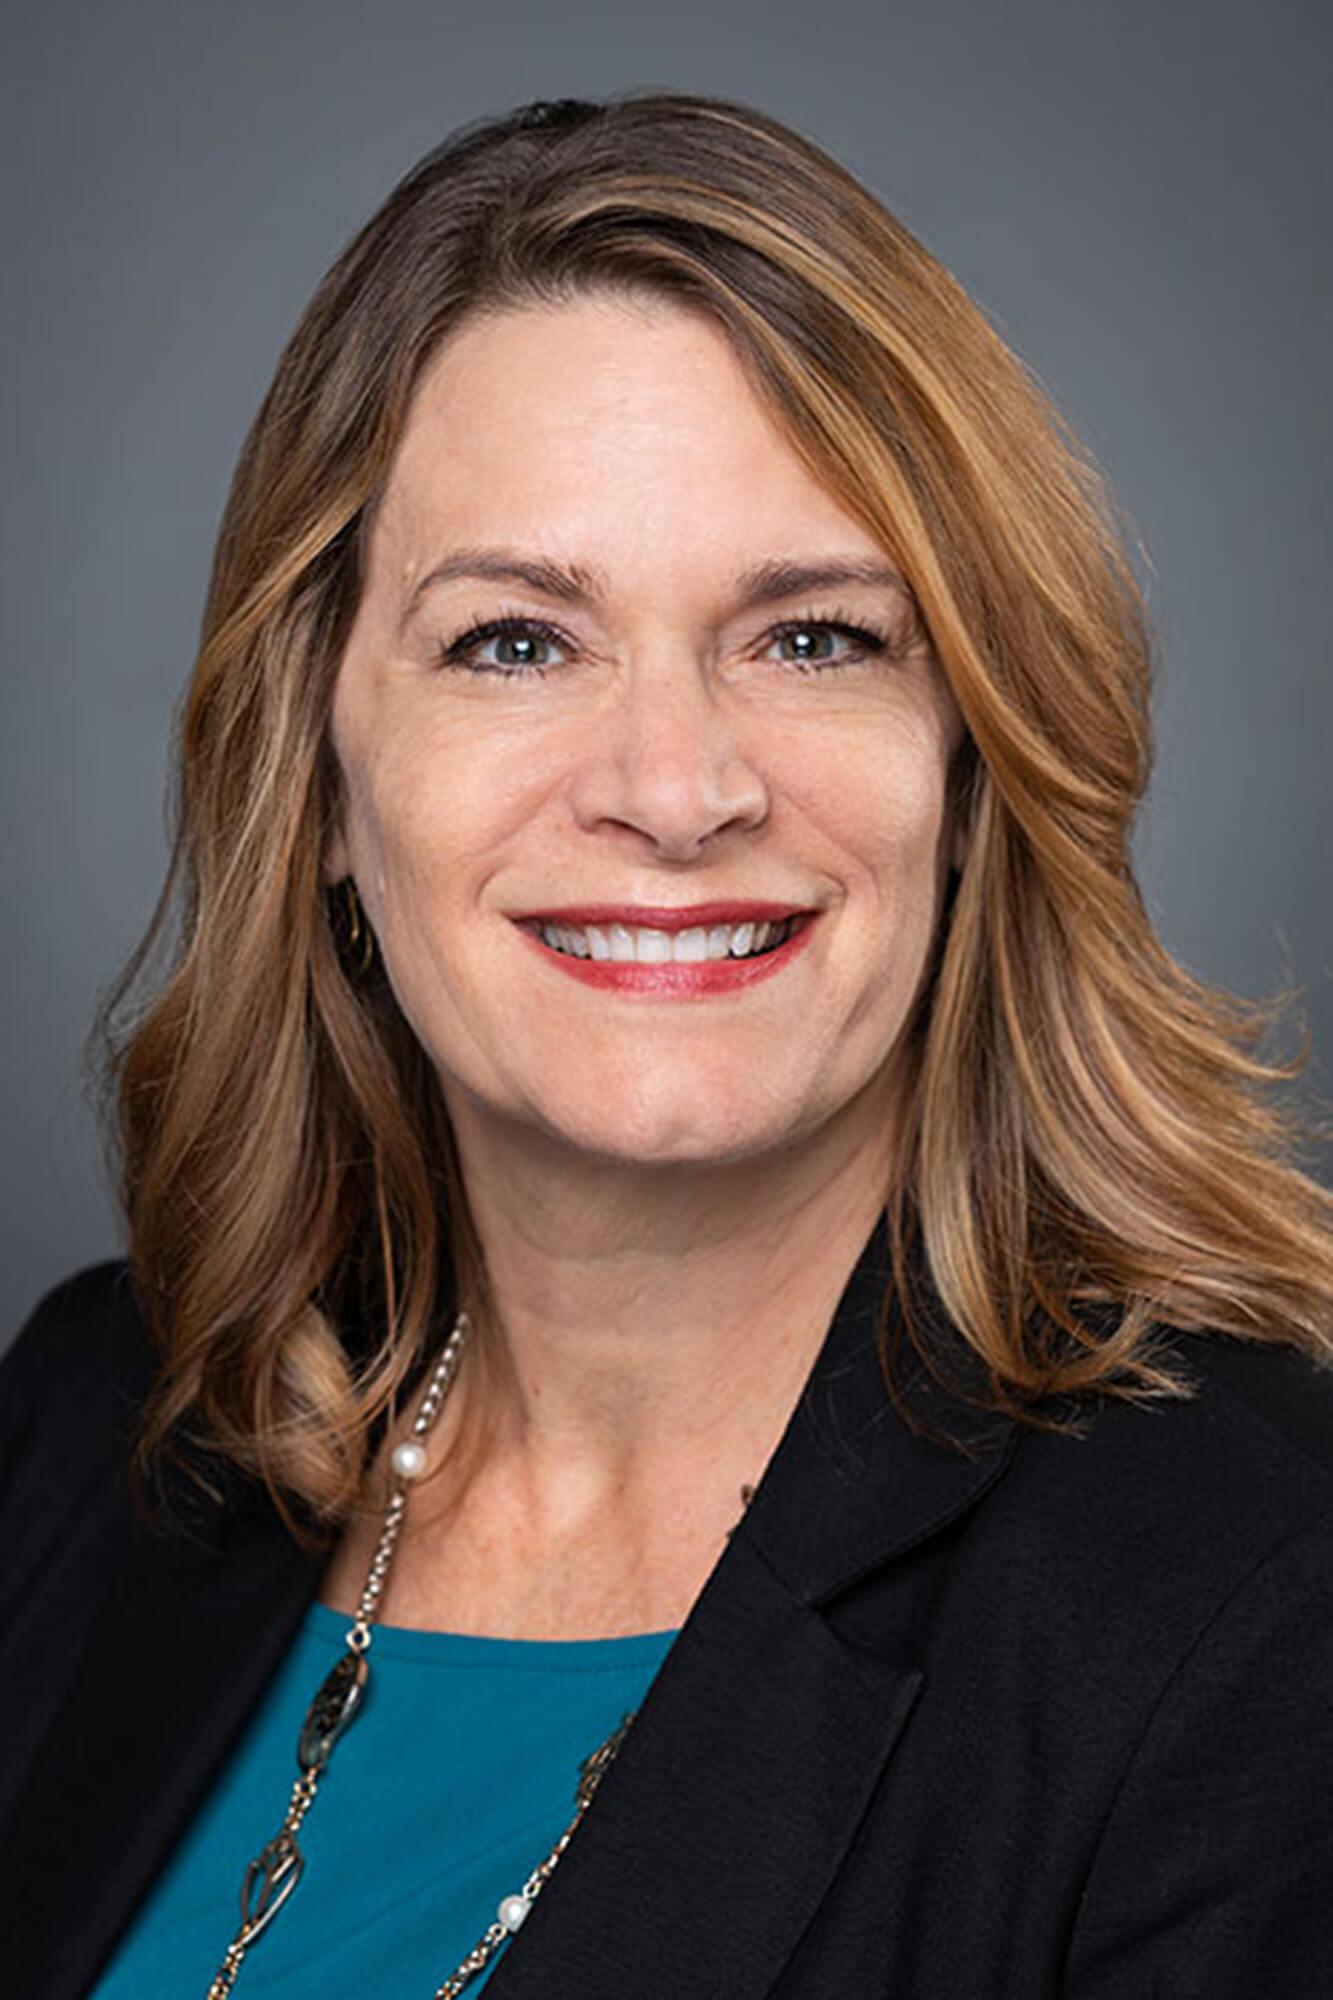 Kathy Gauger